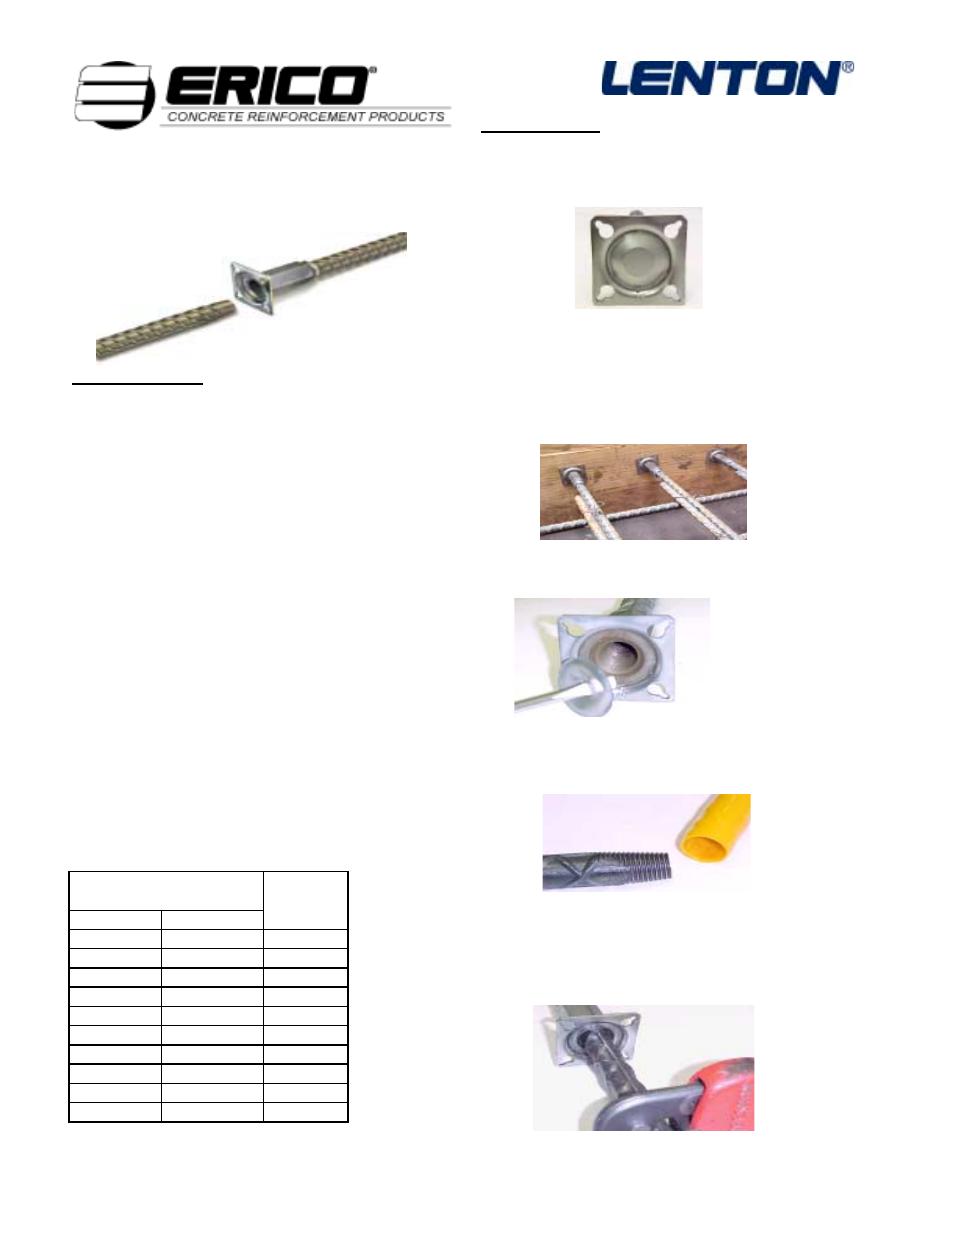 ERICO LENTON FORM SAVERS User Manual | 1 page